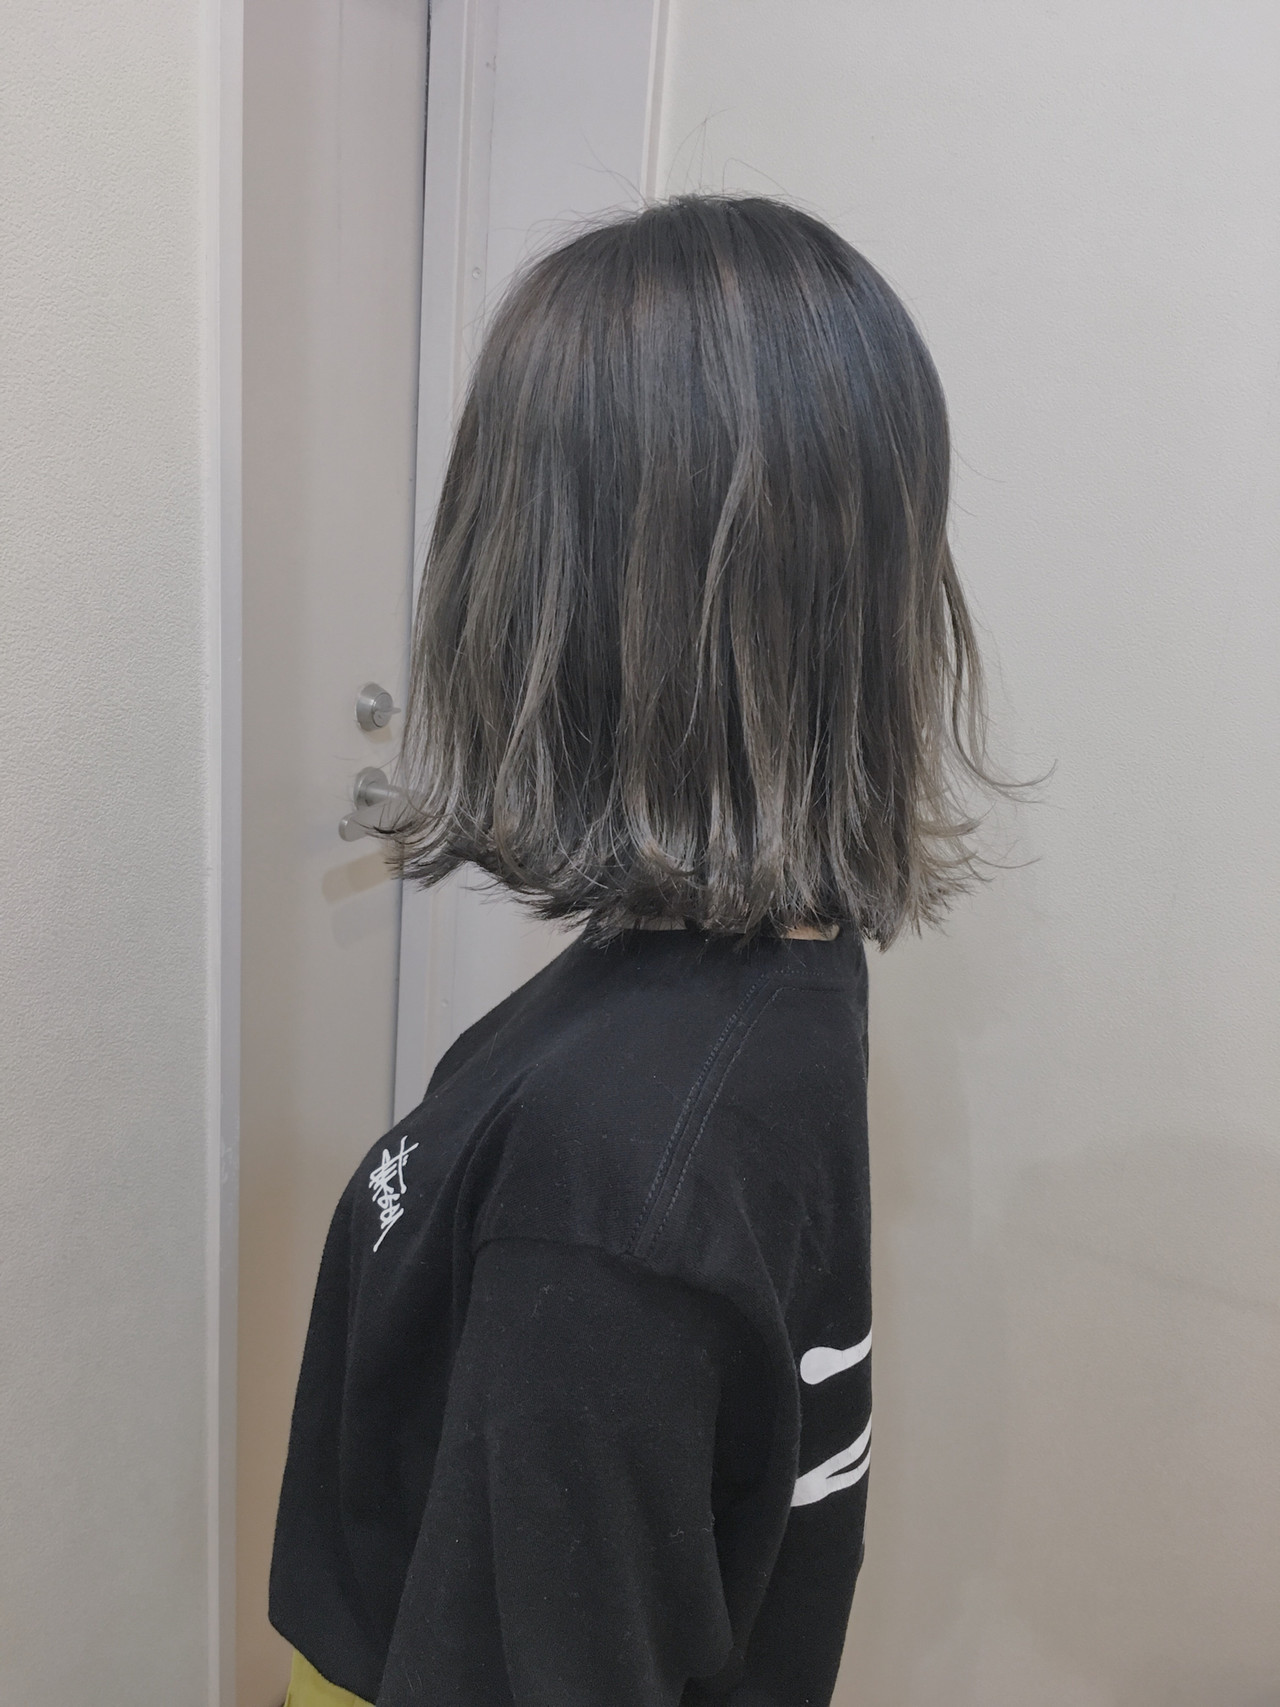 3Dハイライト 大人ハイライト ハイライト バレイヤージュヘアスタイルや髪型の写真・画像